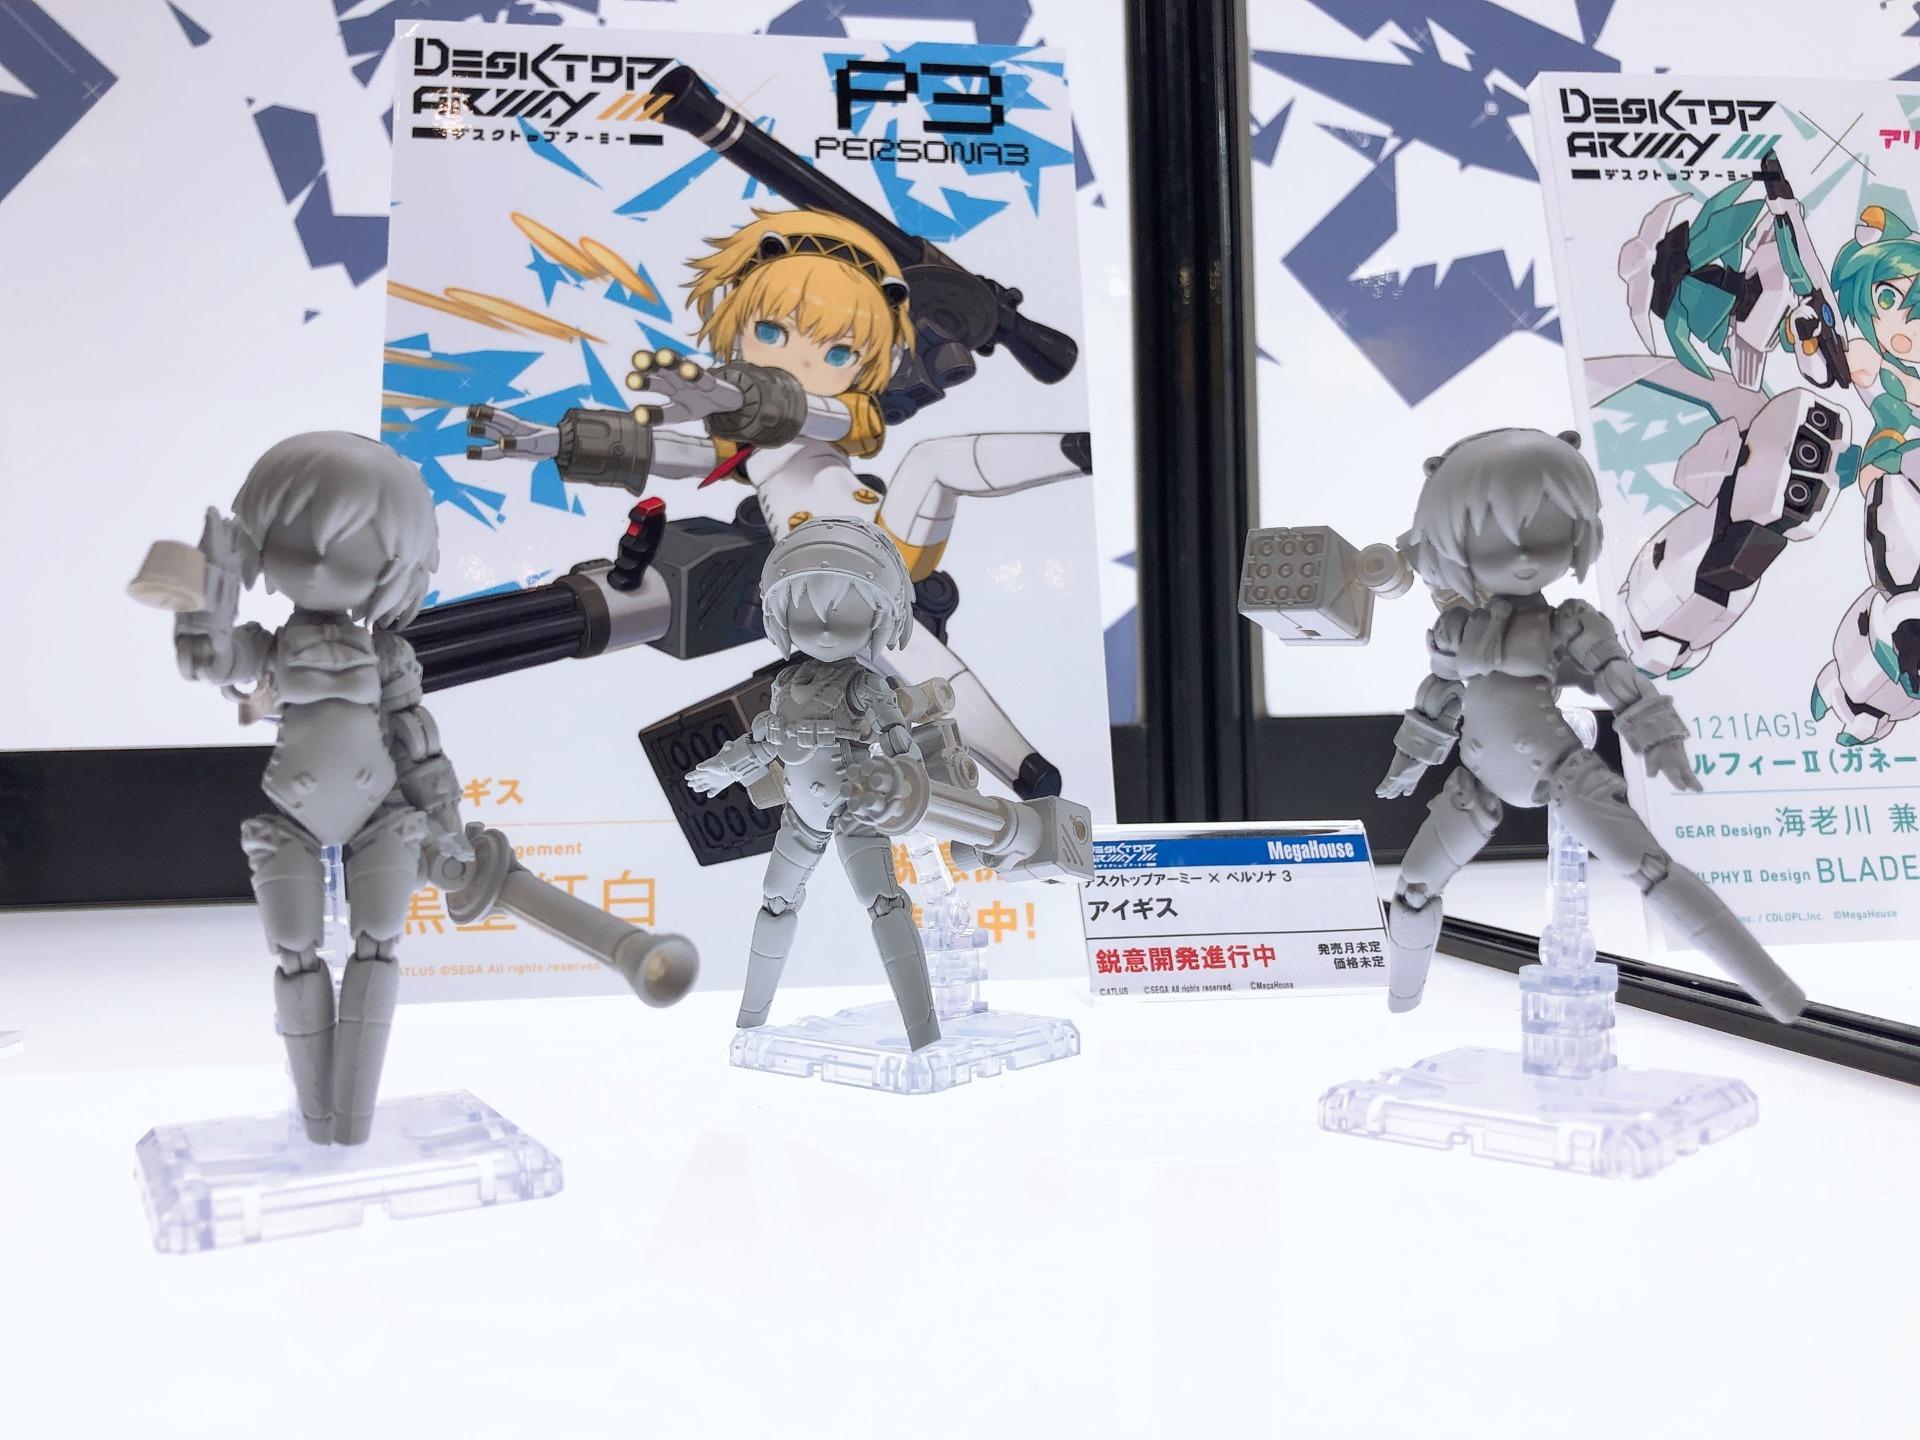 persona 3 figures desktop army aegis